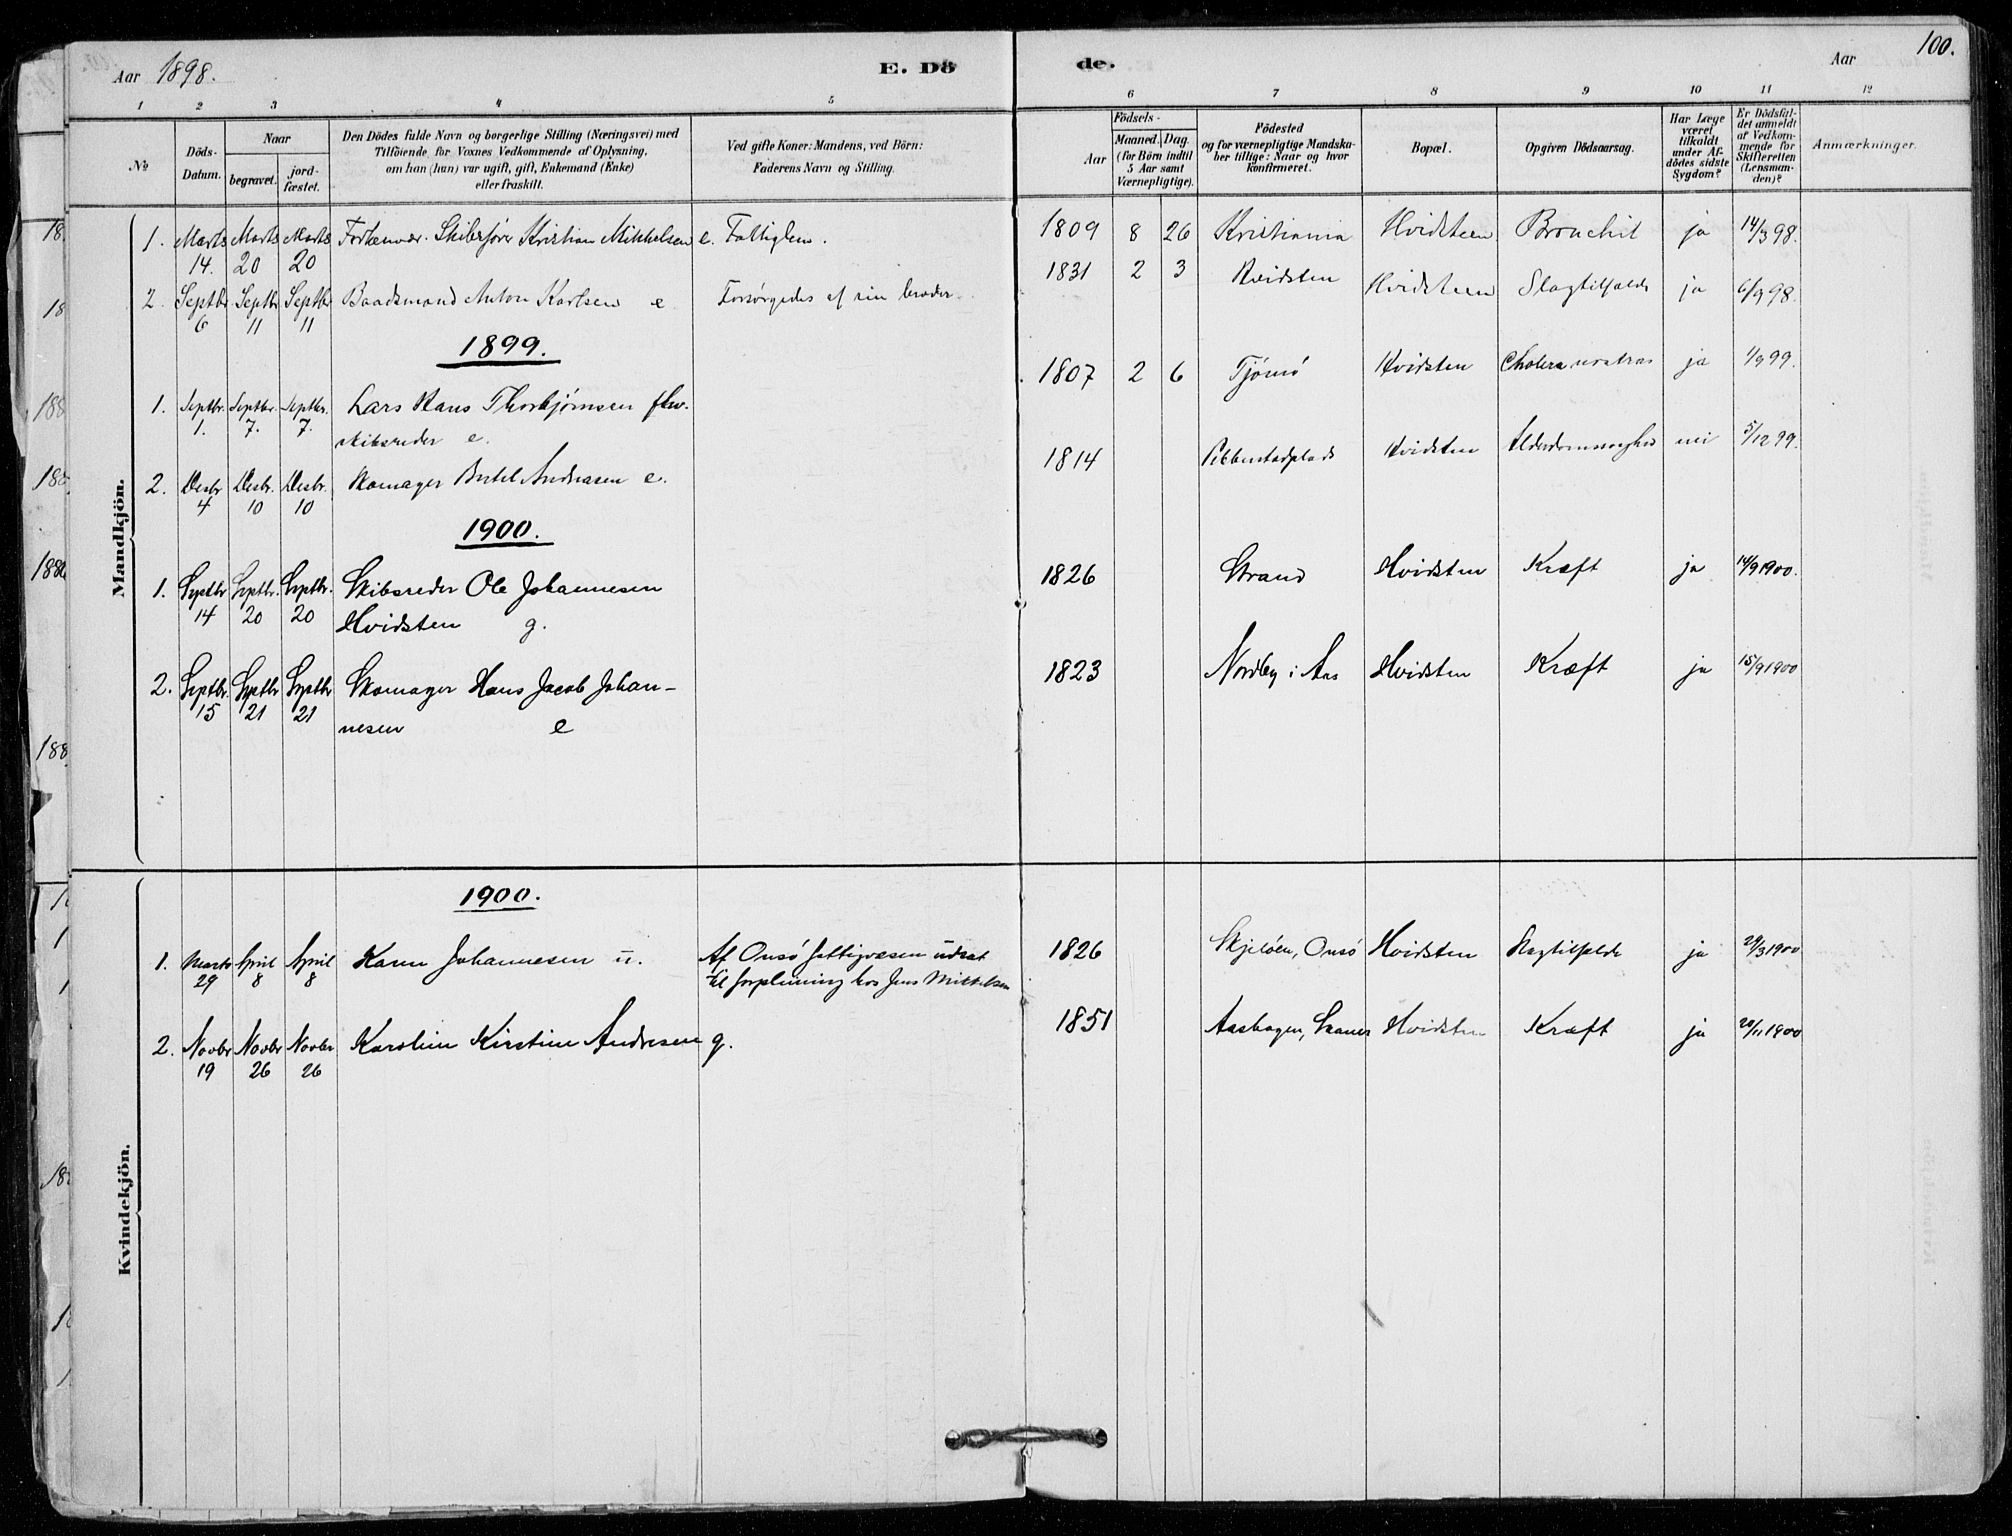 SAO, Vestby prestekontor Kirkebøker, F/Fd/L0001: Ministerialbok nr. IV 1, 1878-1945, s. 100